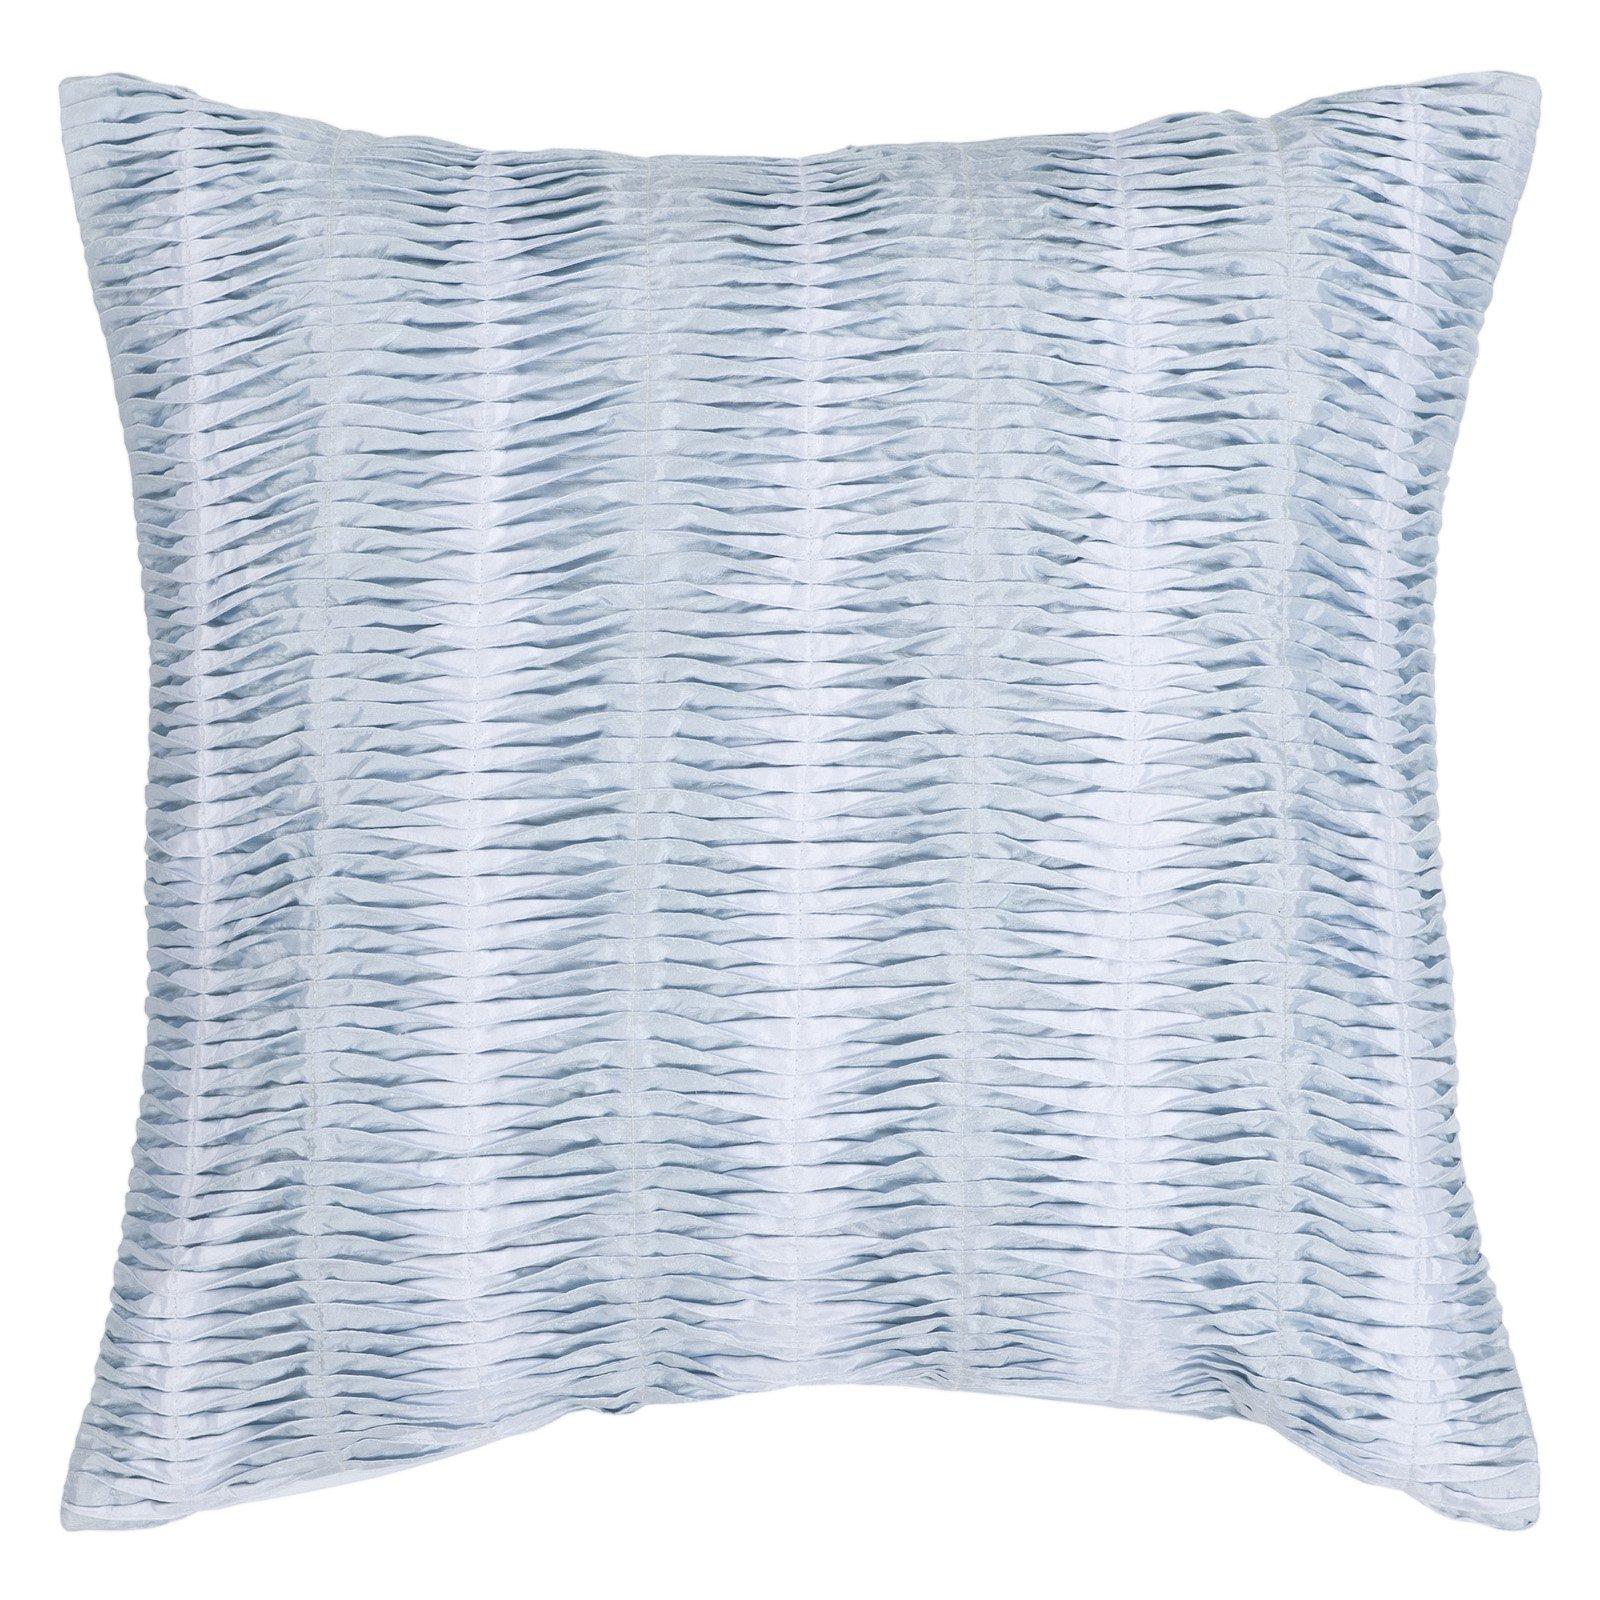 Surya Mystical Pleat Decorative Pillow - Blue